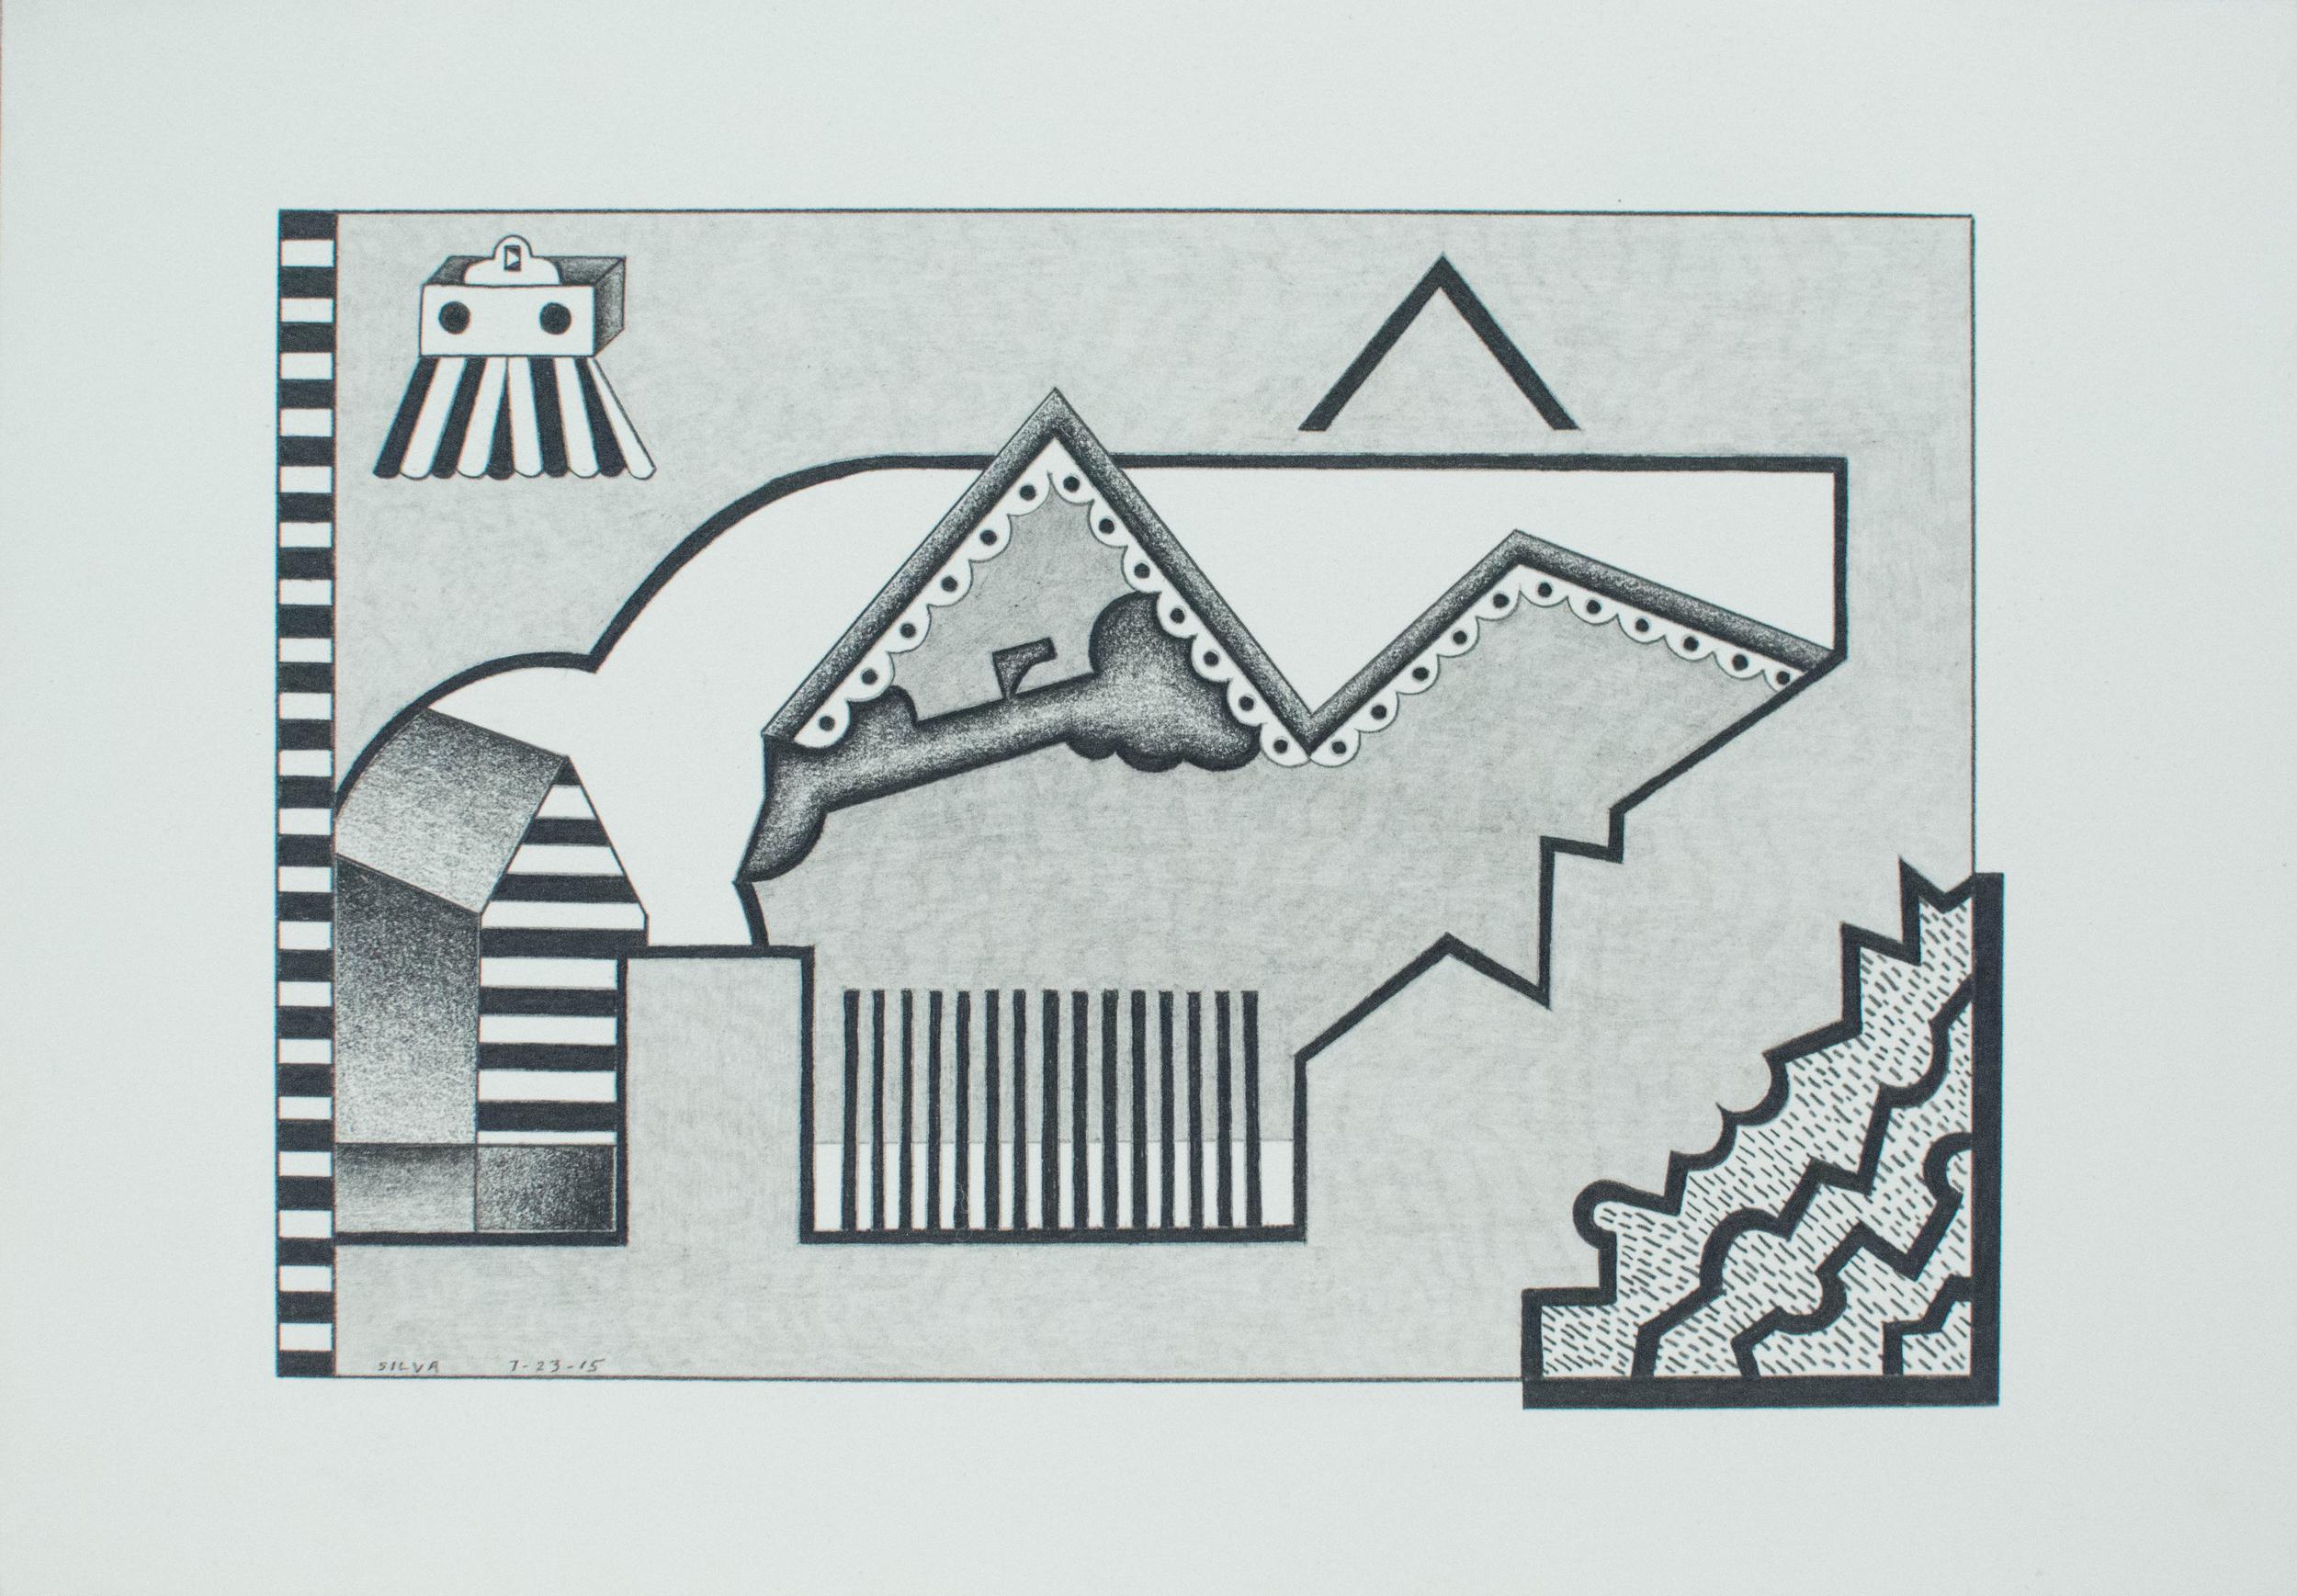 7-23-15, 2015, Graphite on paper, 7 x 10 inches